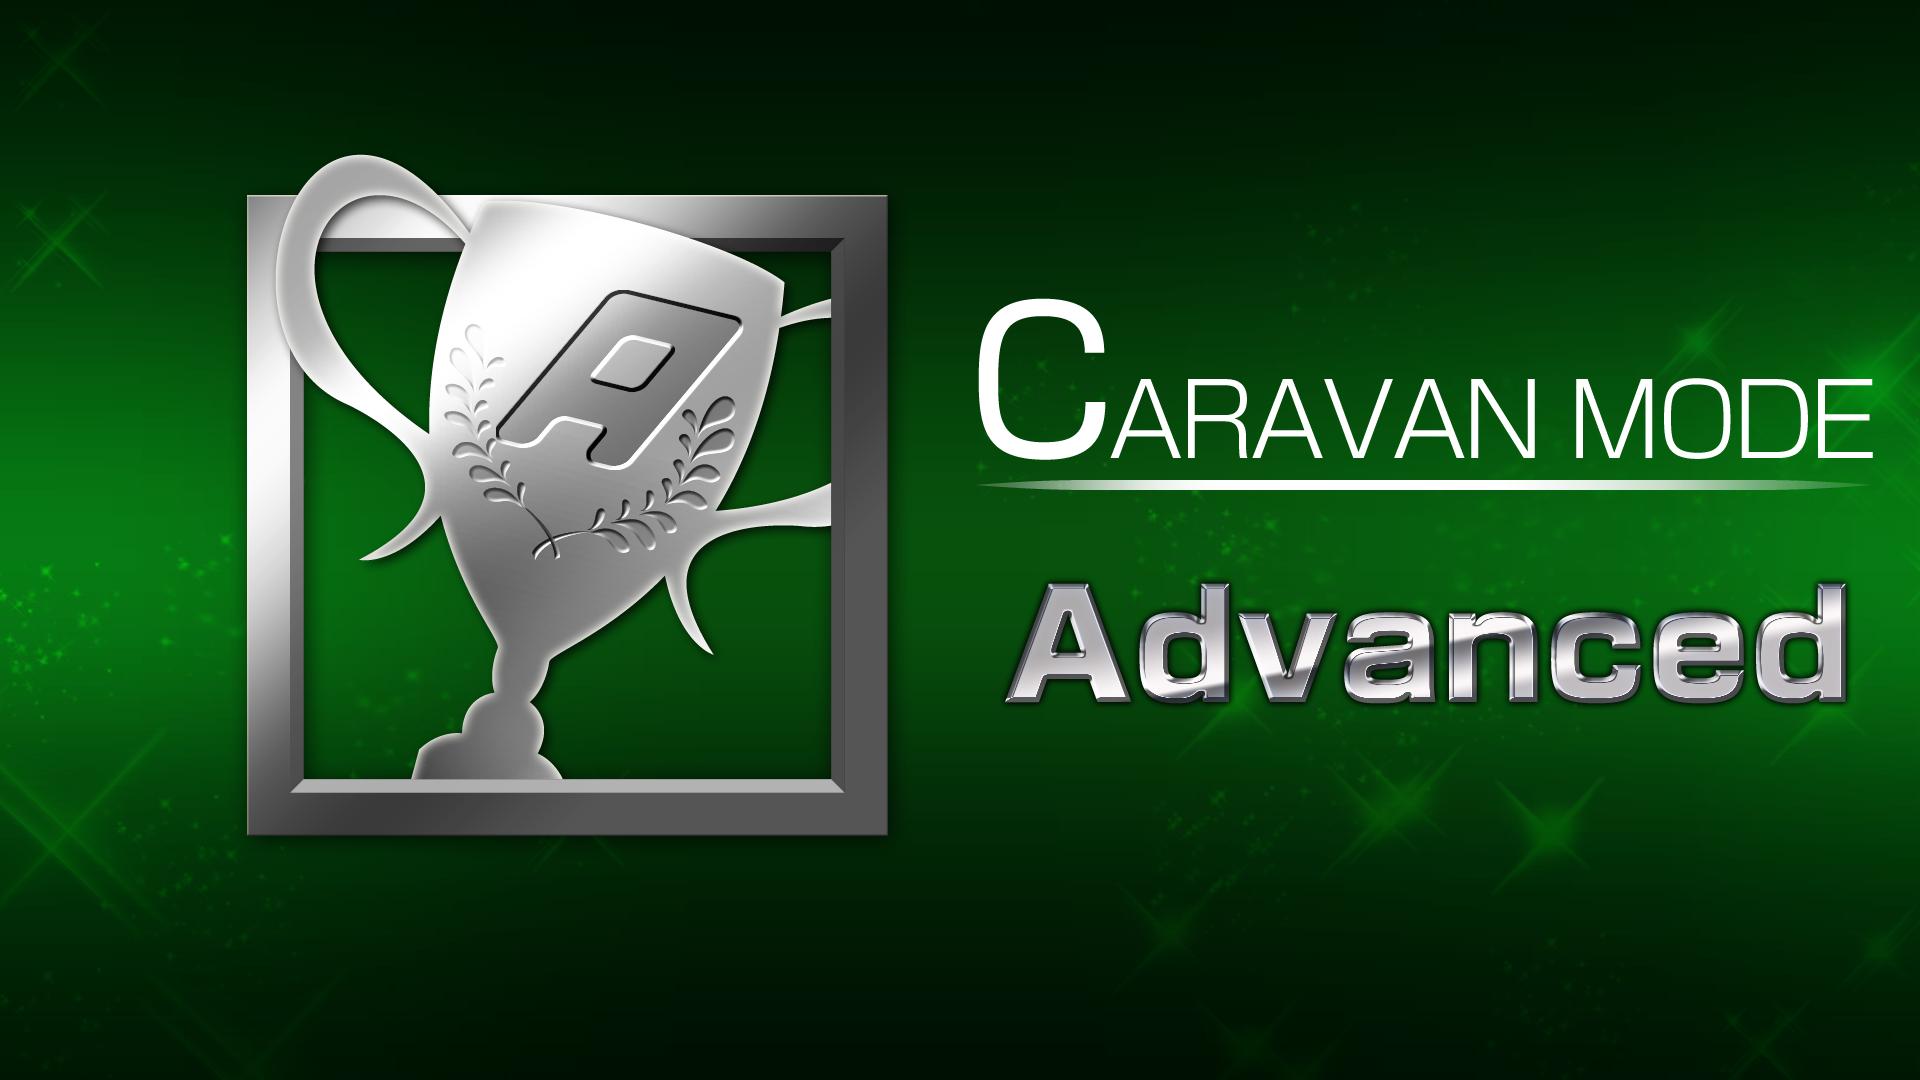 Icon for CARAVAN MODE 20,000 points